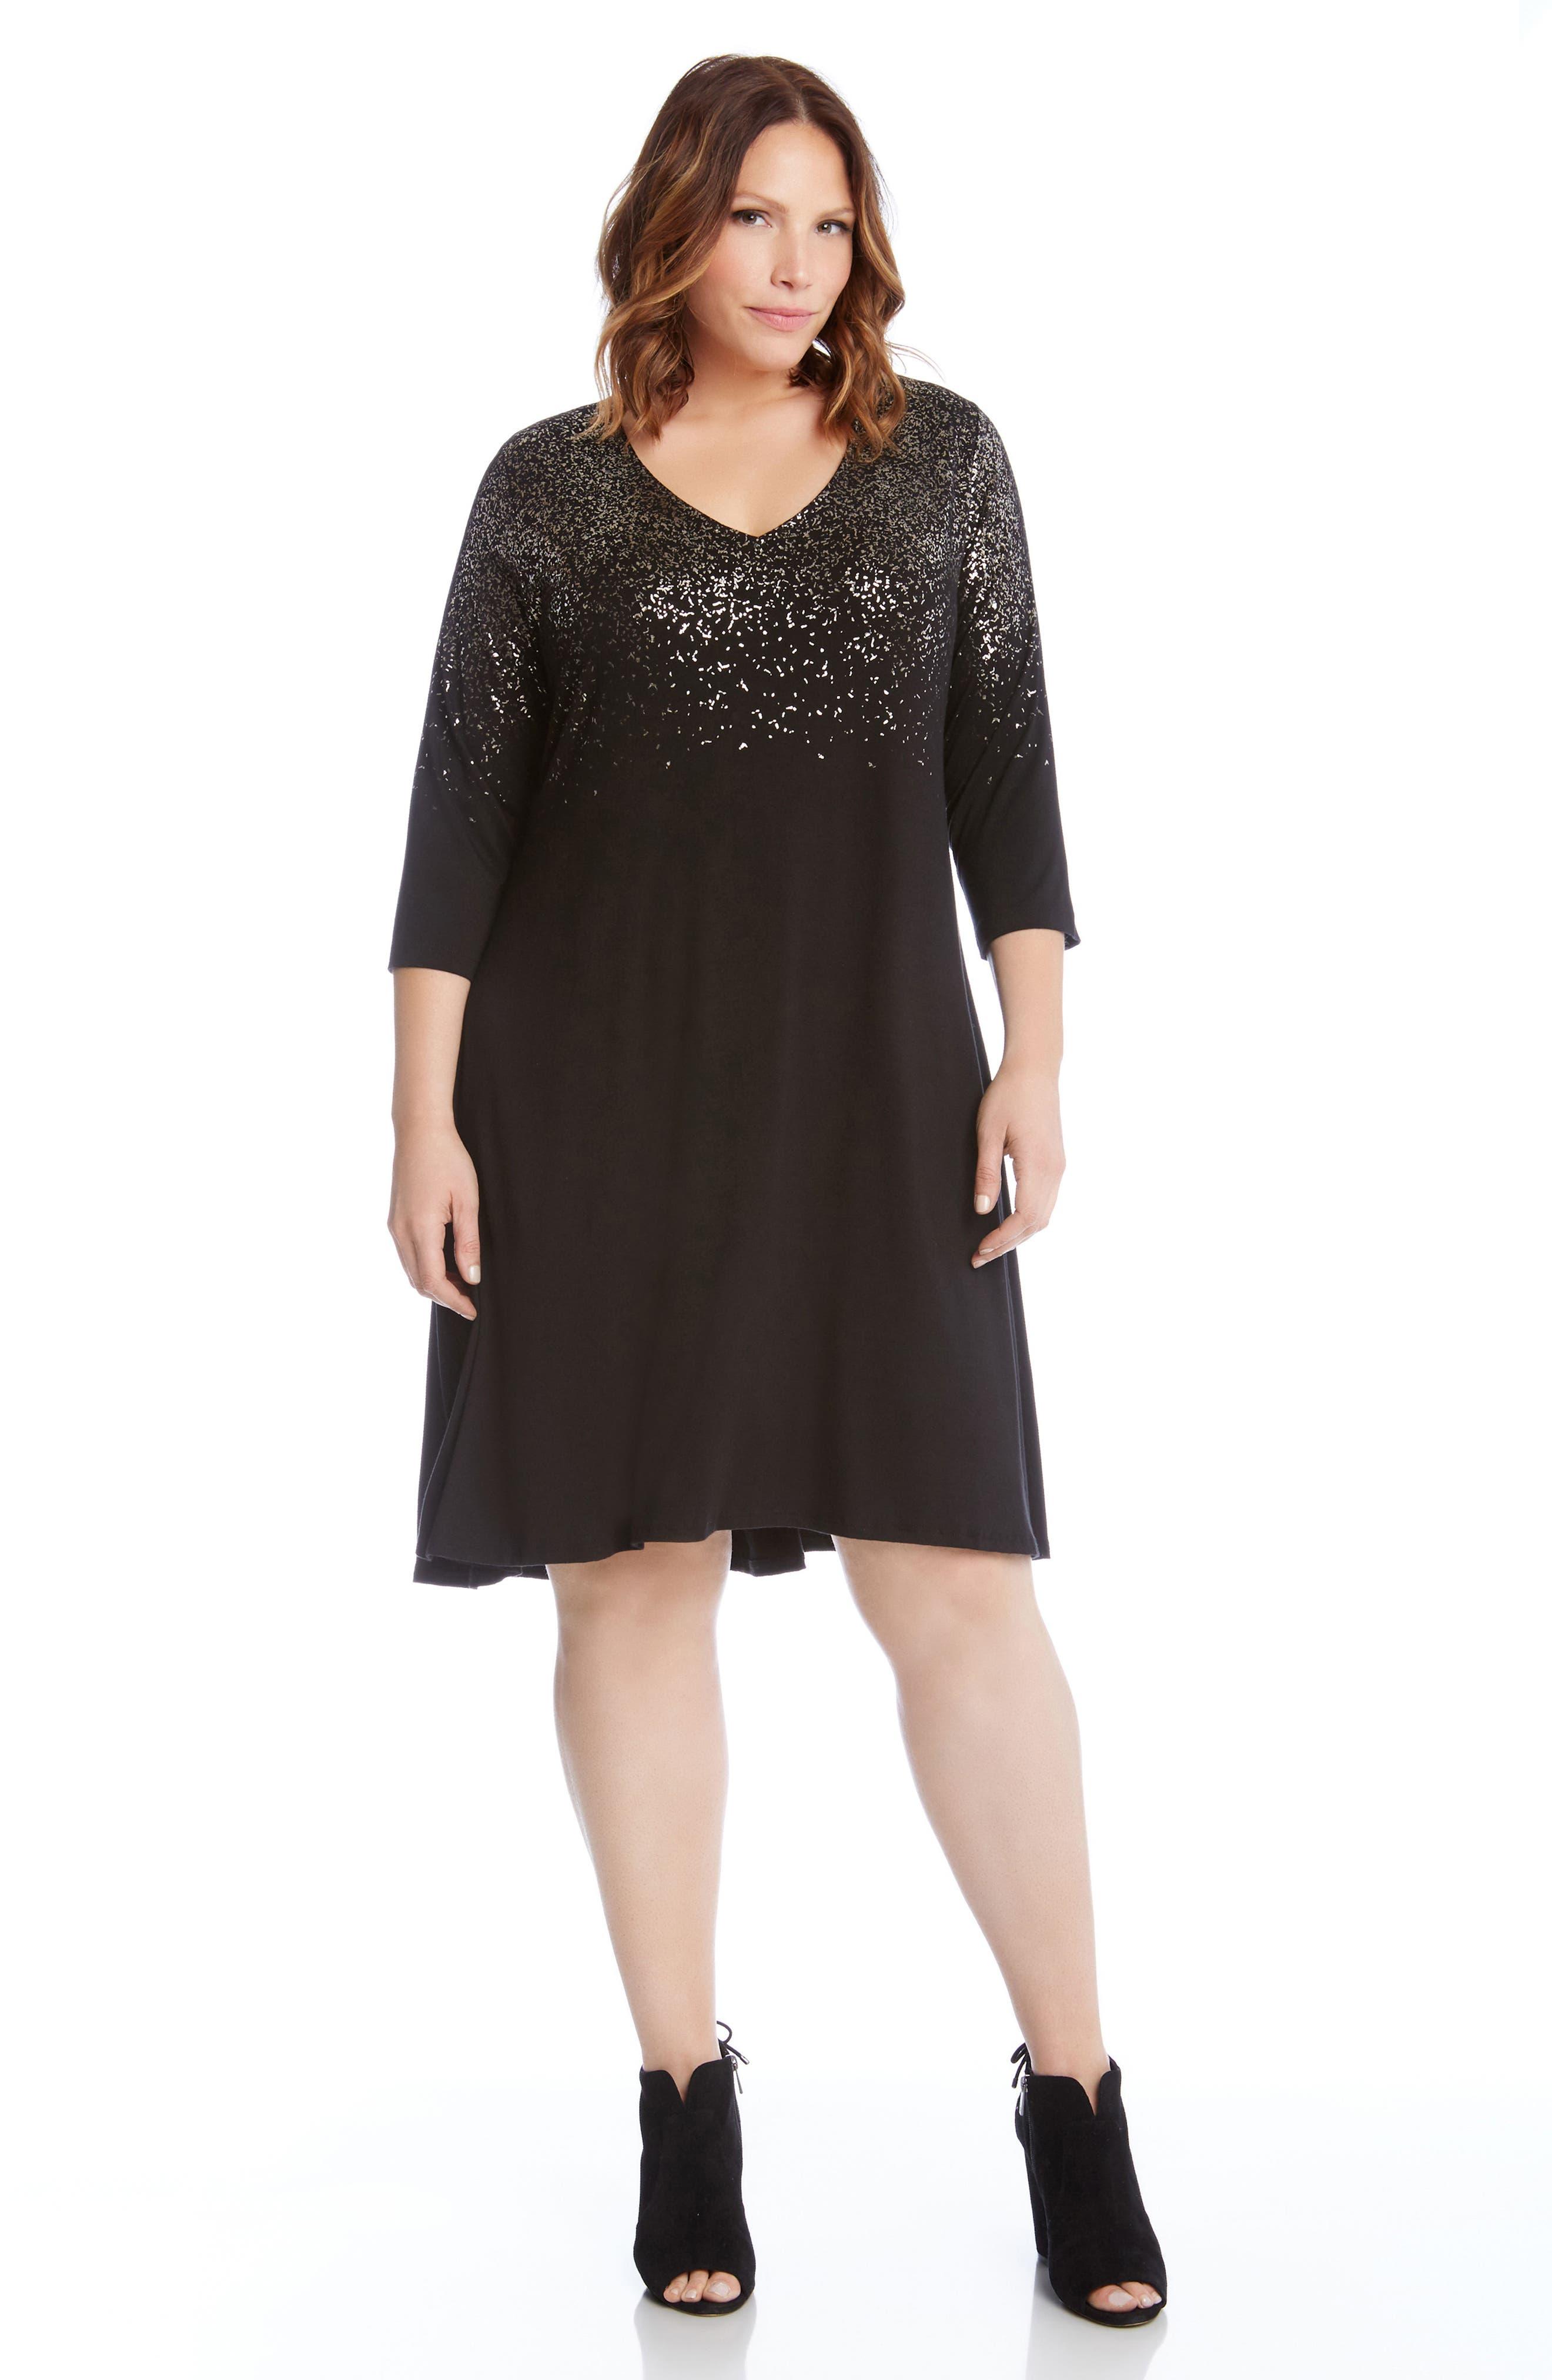 Speckled Print A-Line Dress,                             Alternate thumbnail 3, color,